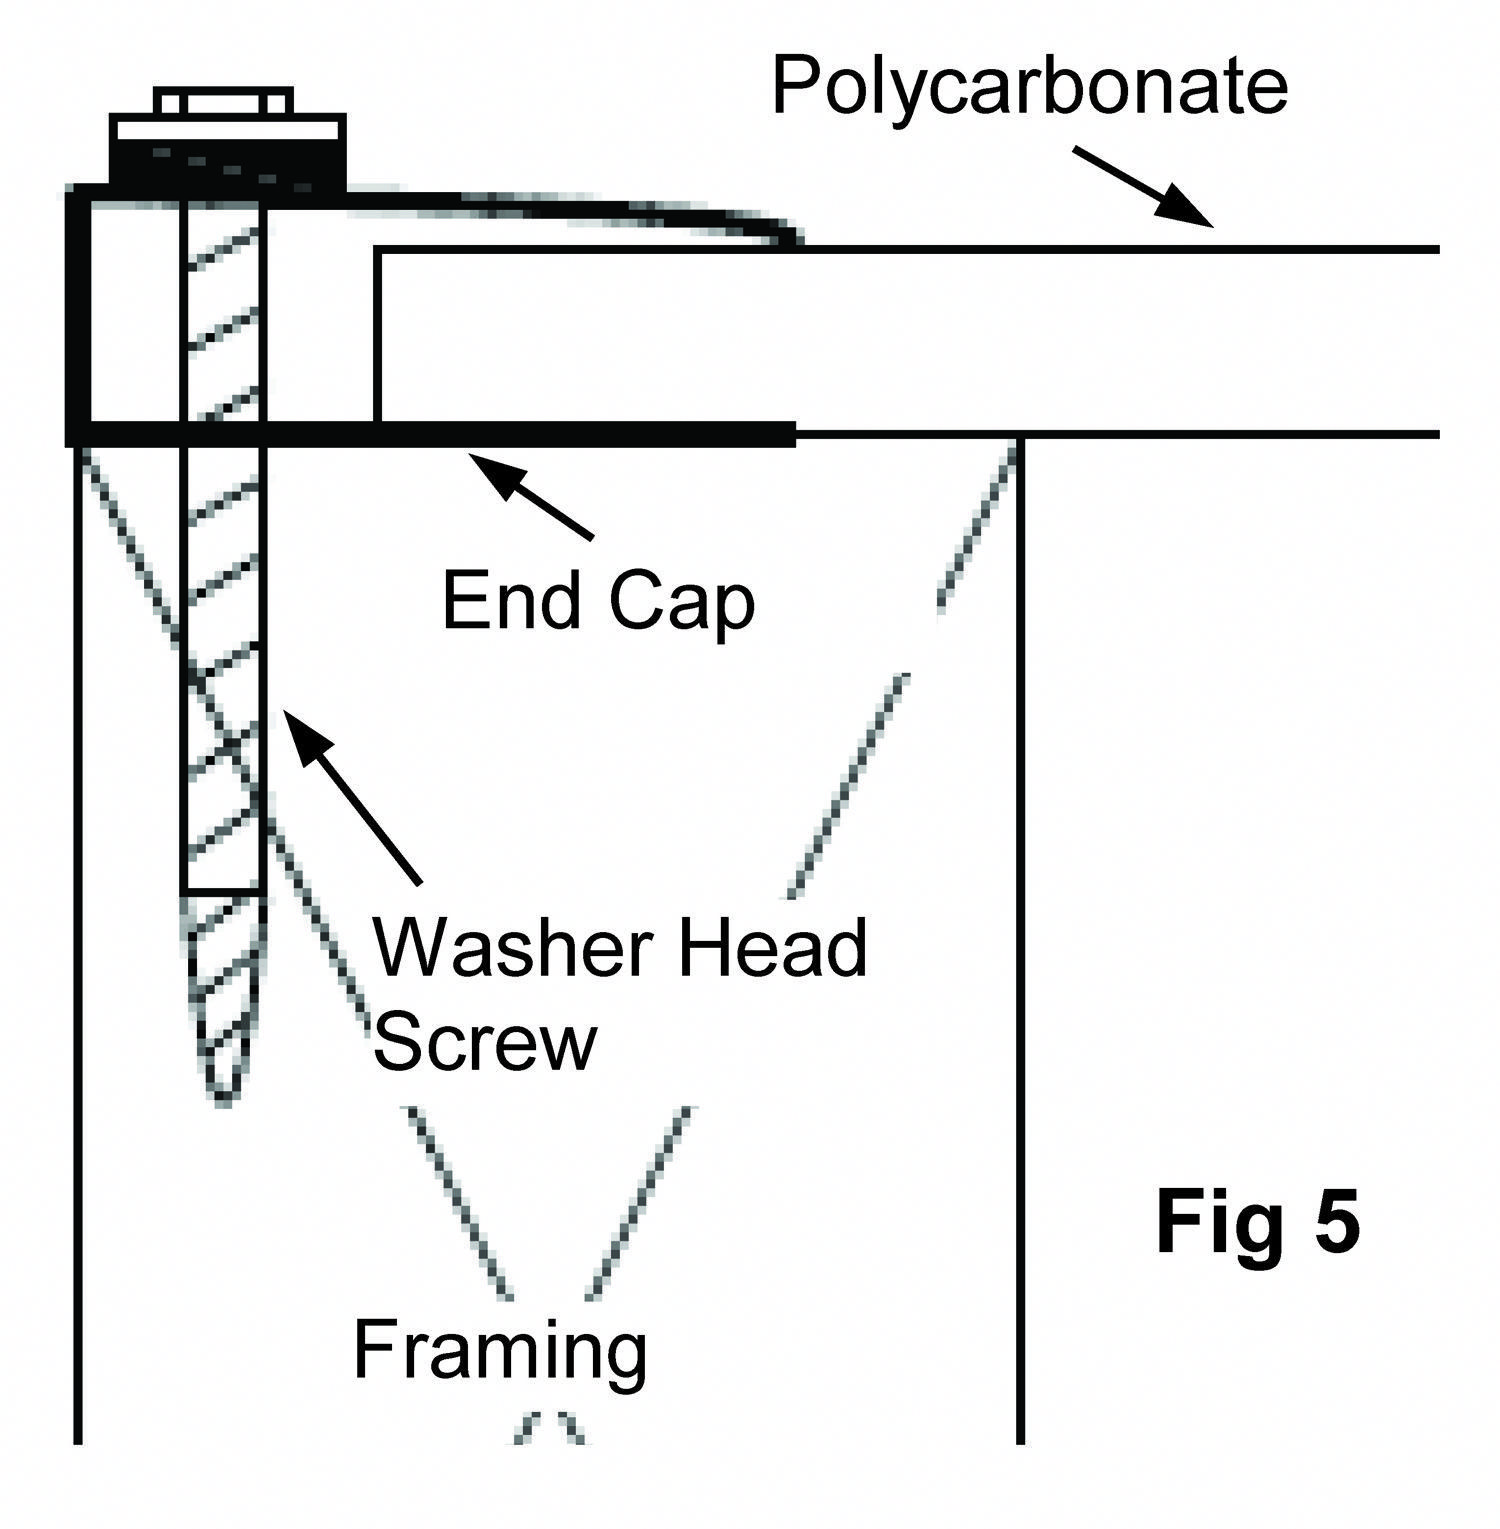 Pergolas For Sale Cheap Pergolanewpreston Pergolakitsnearme Roof Truss Design Polycarbonate Roof Panels Roof Trusses